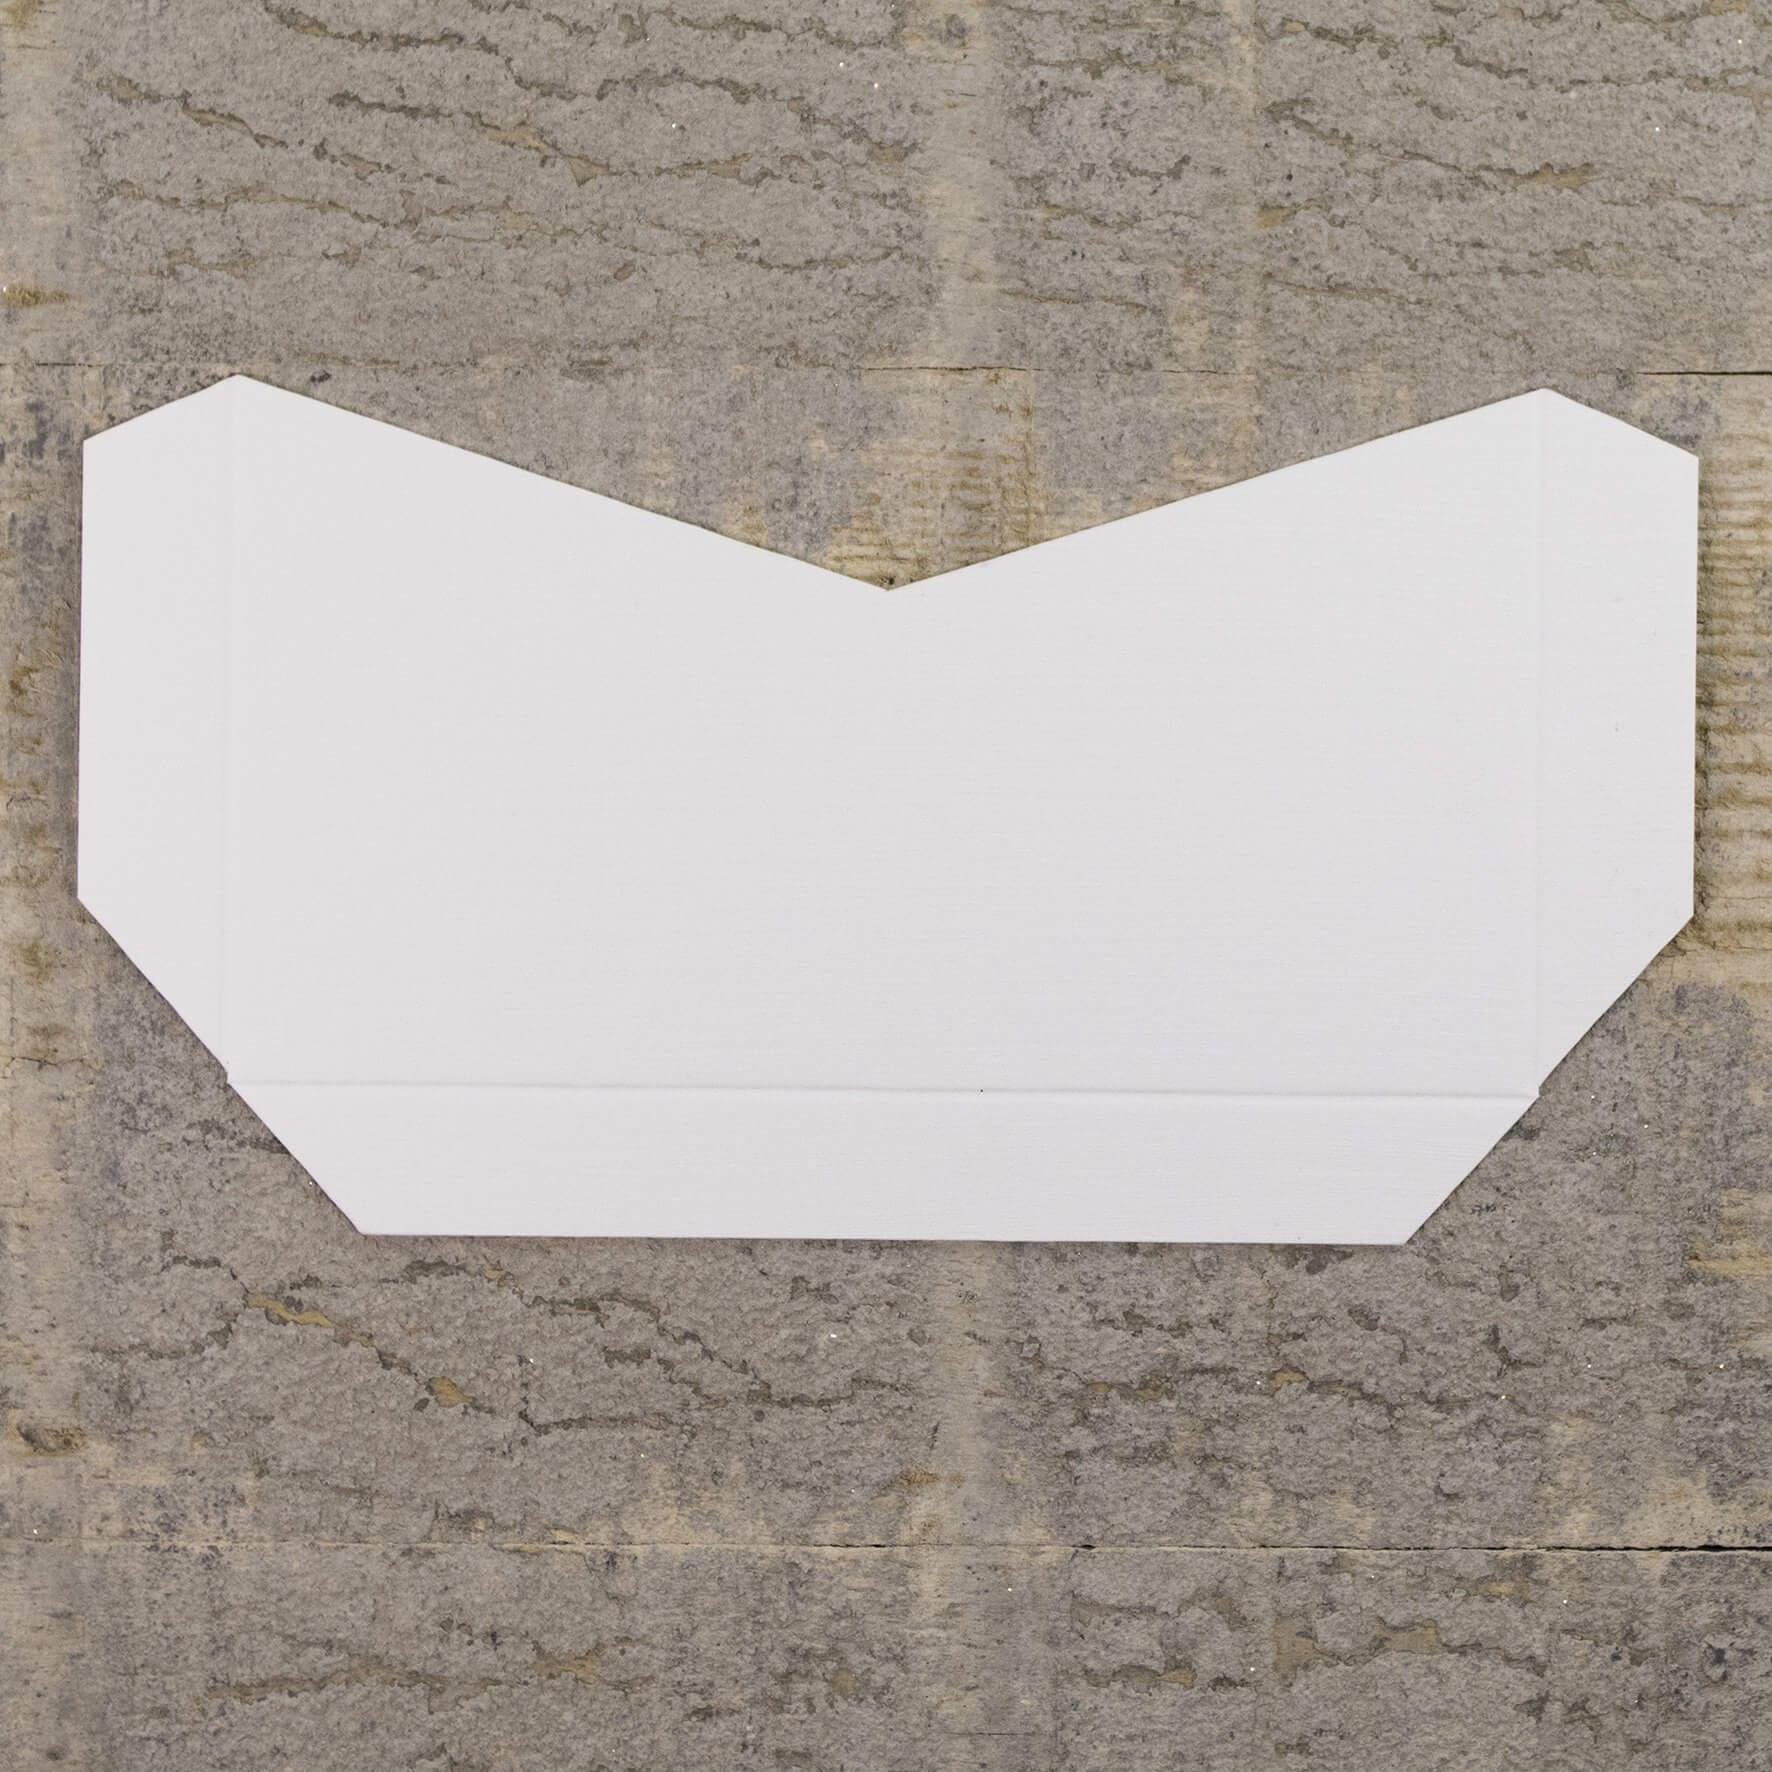 Enfolio Tentfold (Lg Sq) Add On Pocket - Silkweave White